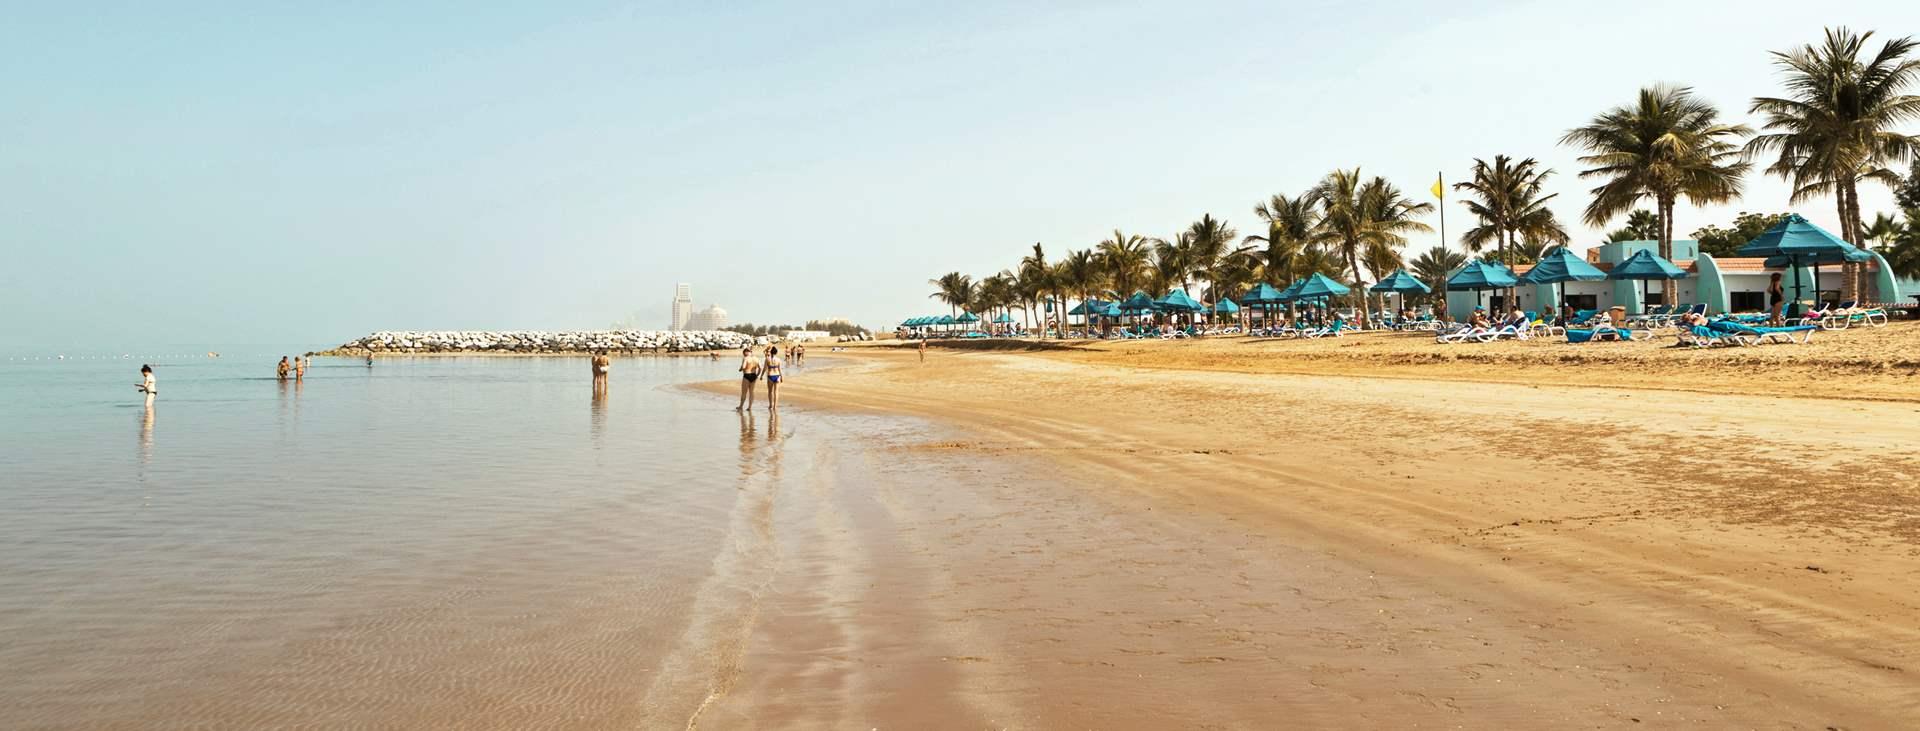 smartline Ras Al Khaimah Beach Resortin edessä oleva ranta